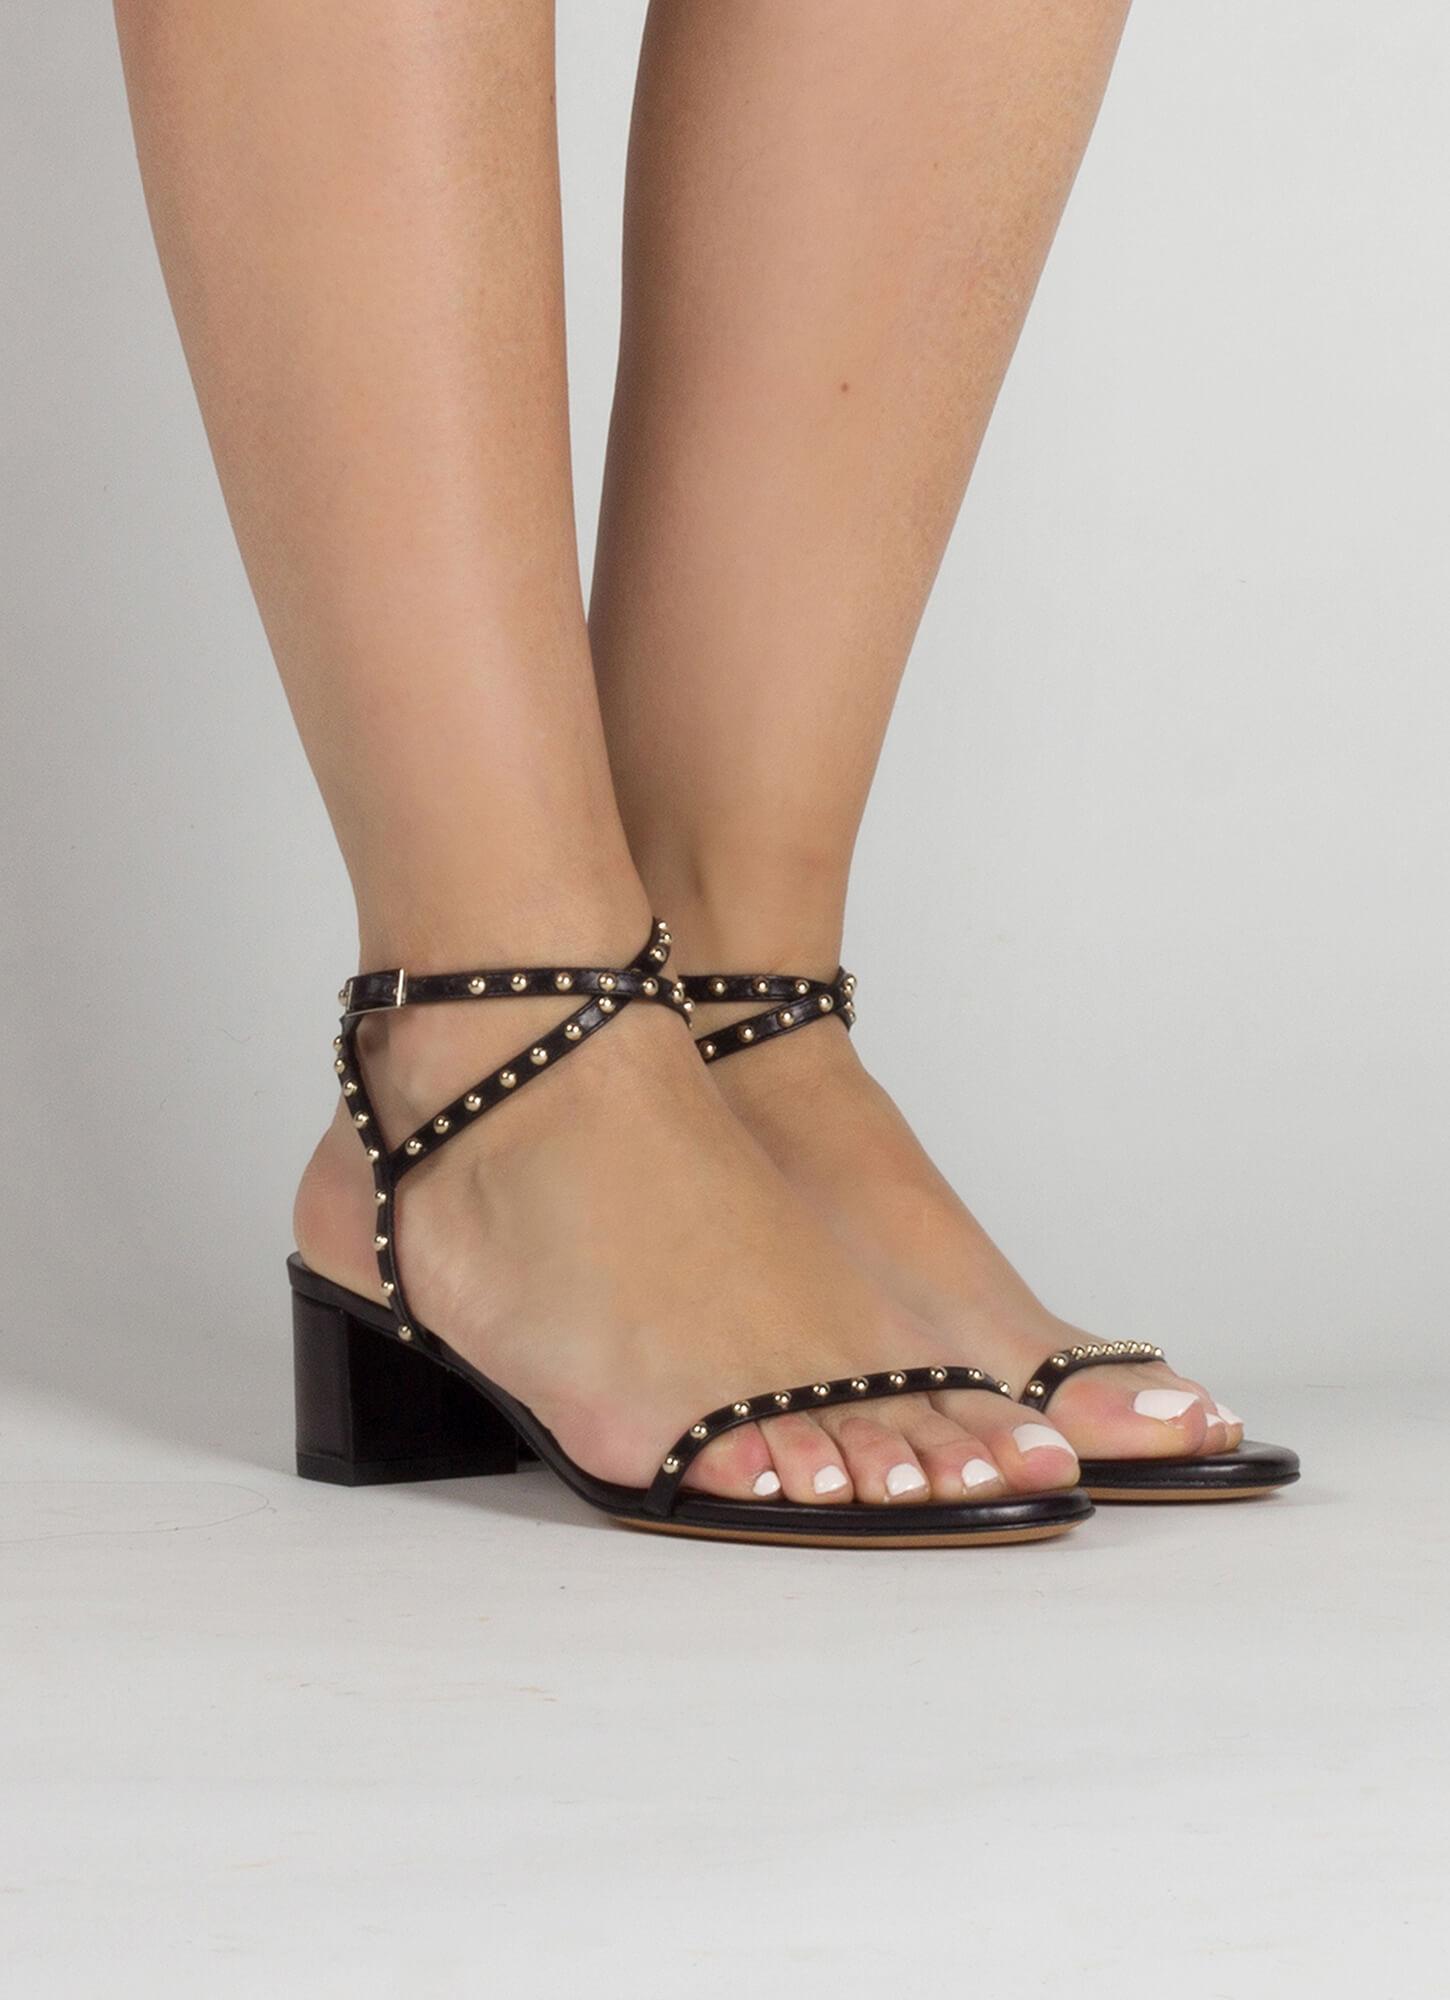 44a434926 Olmeneta sandals Pura López. Studded mid block heel sandals in black  leather Studded mid block heel sandals in black leather ...